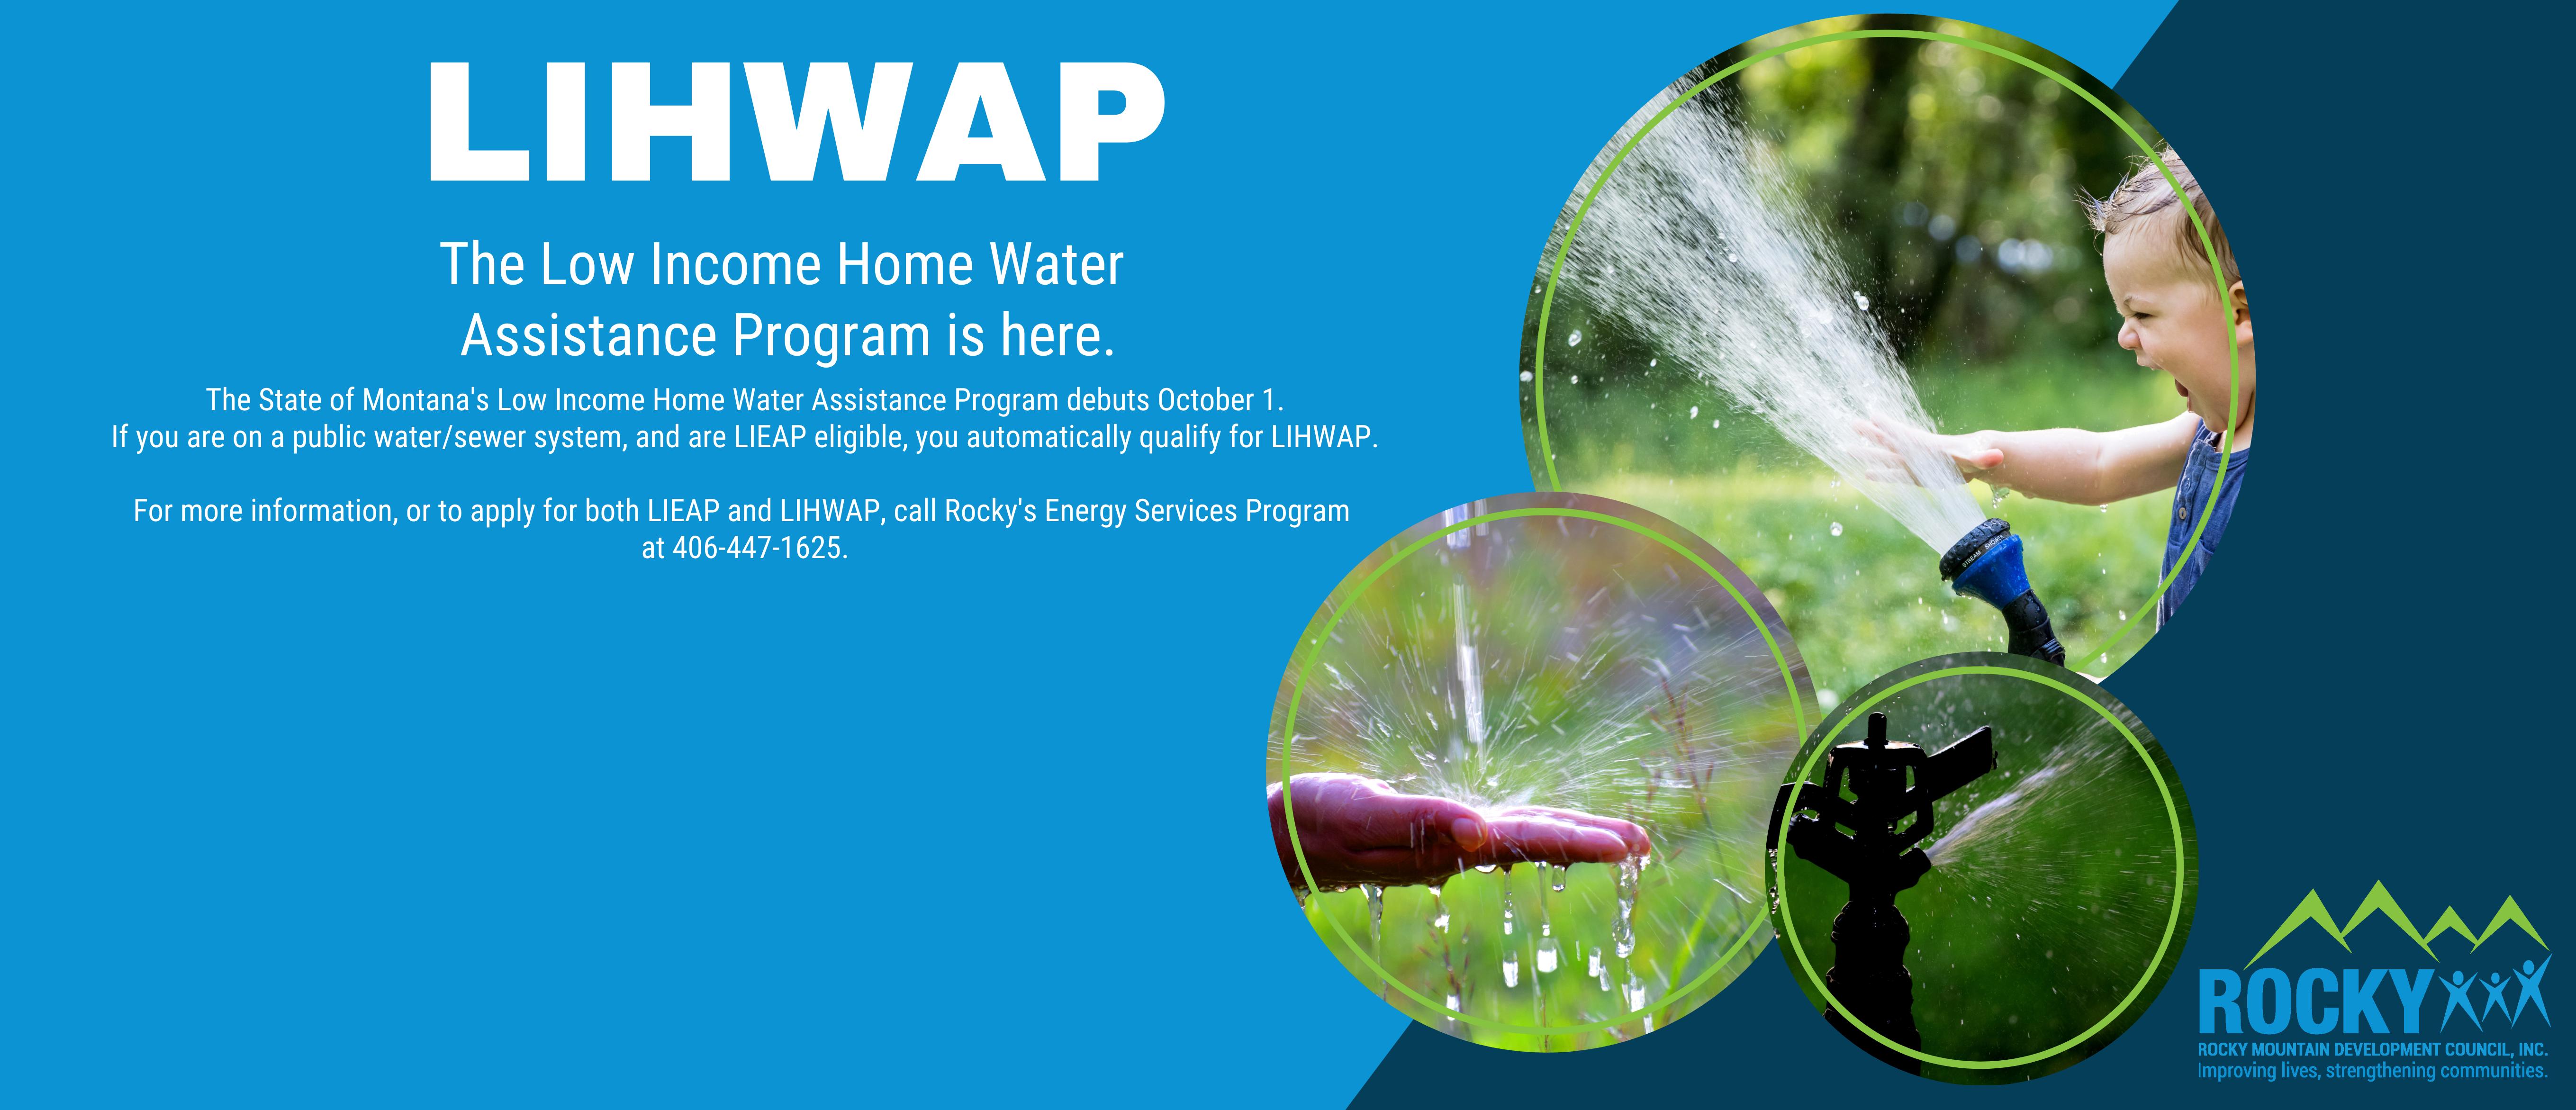 Low Income Home Water Assistance Program (LIHWAP)